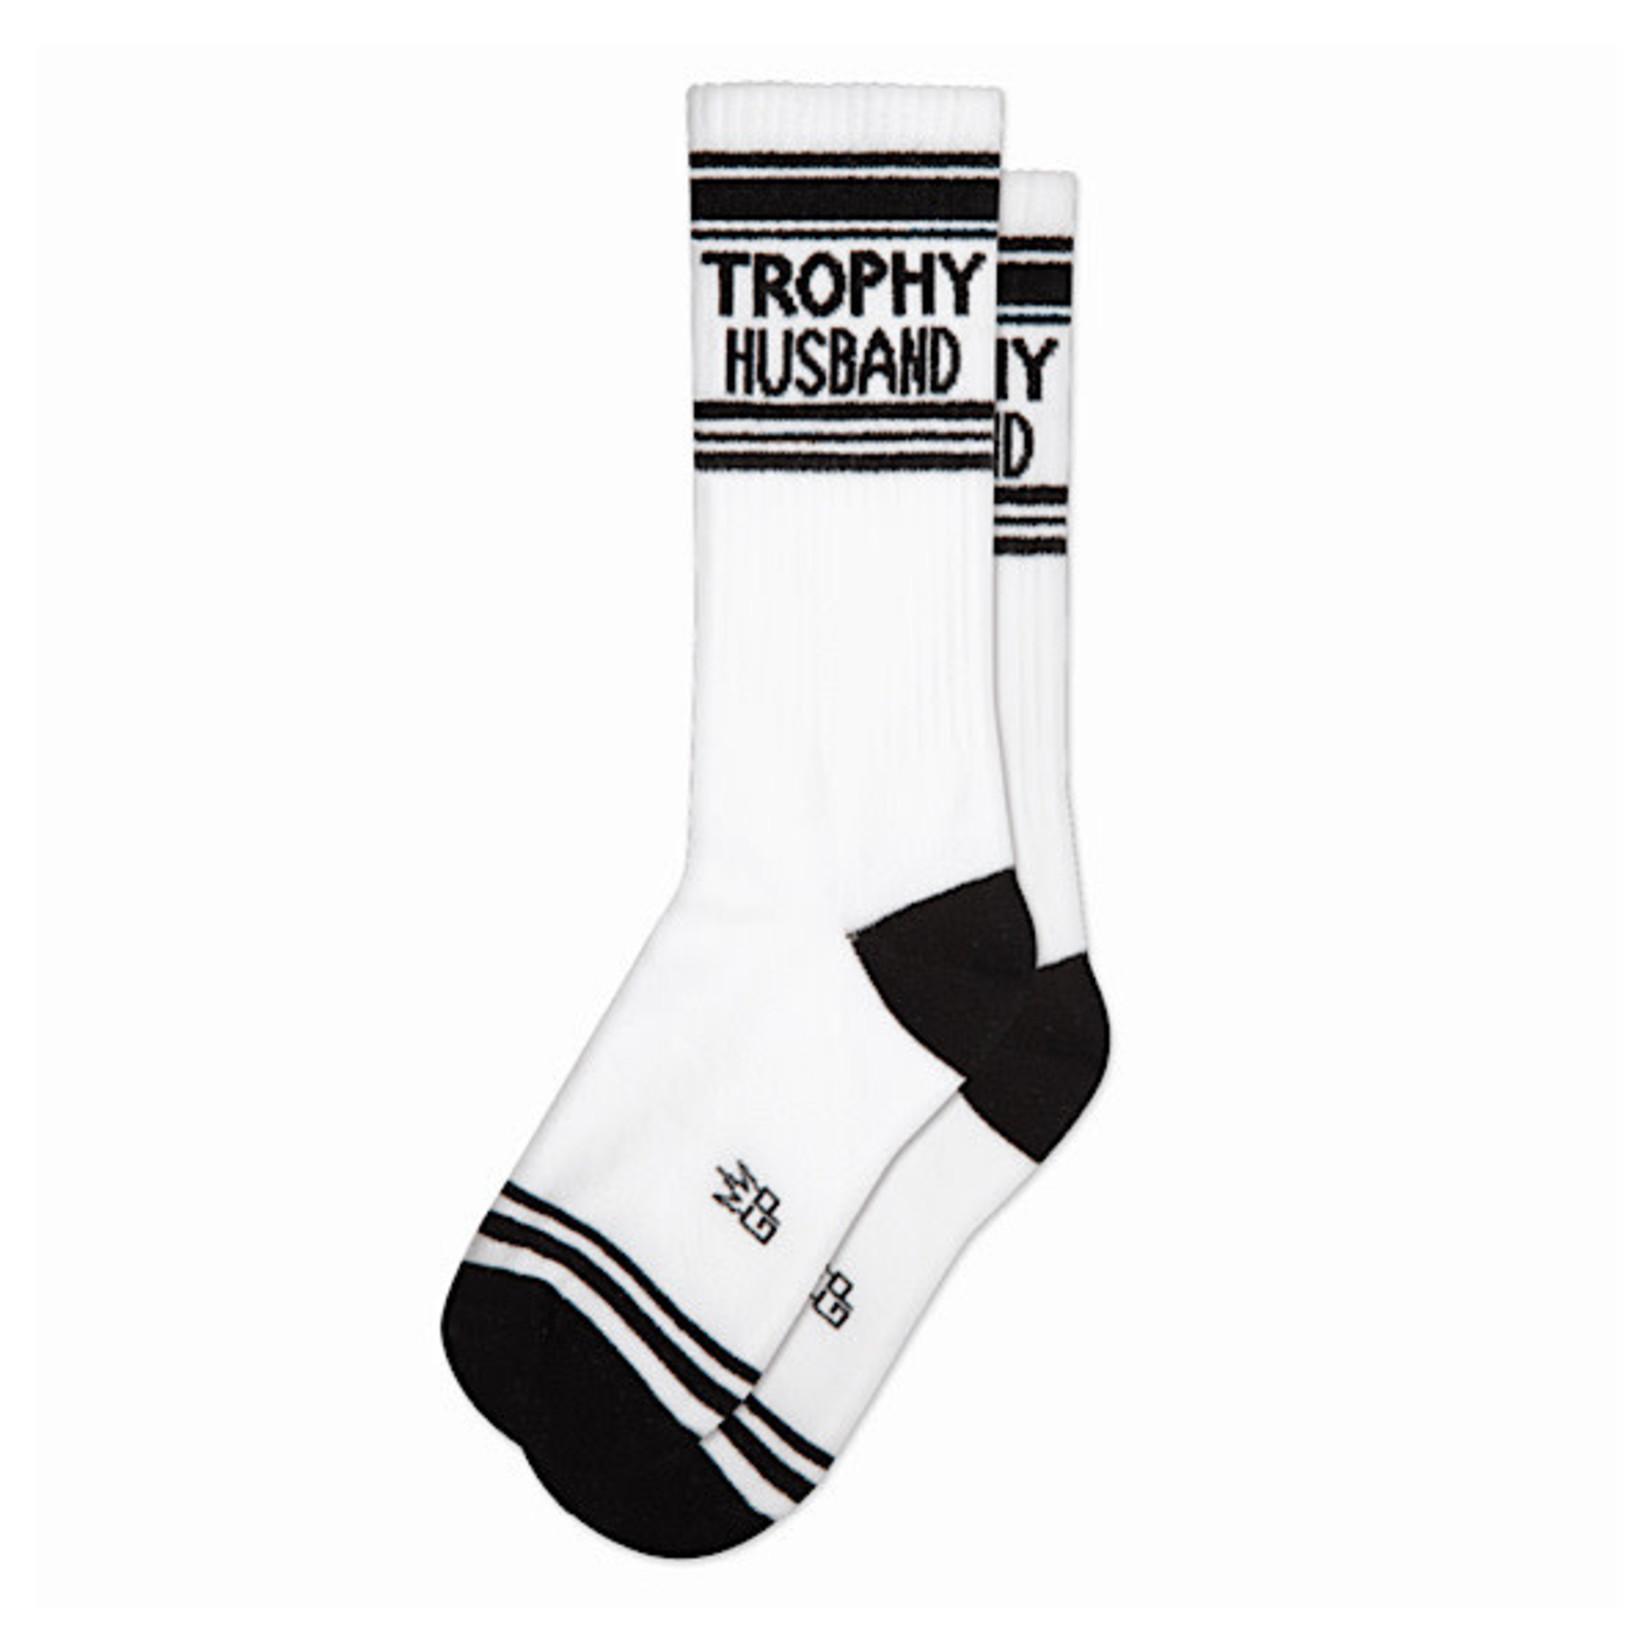 Socks (Unisex) - Trophy Husband